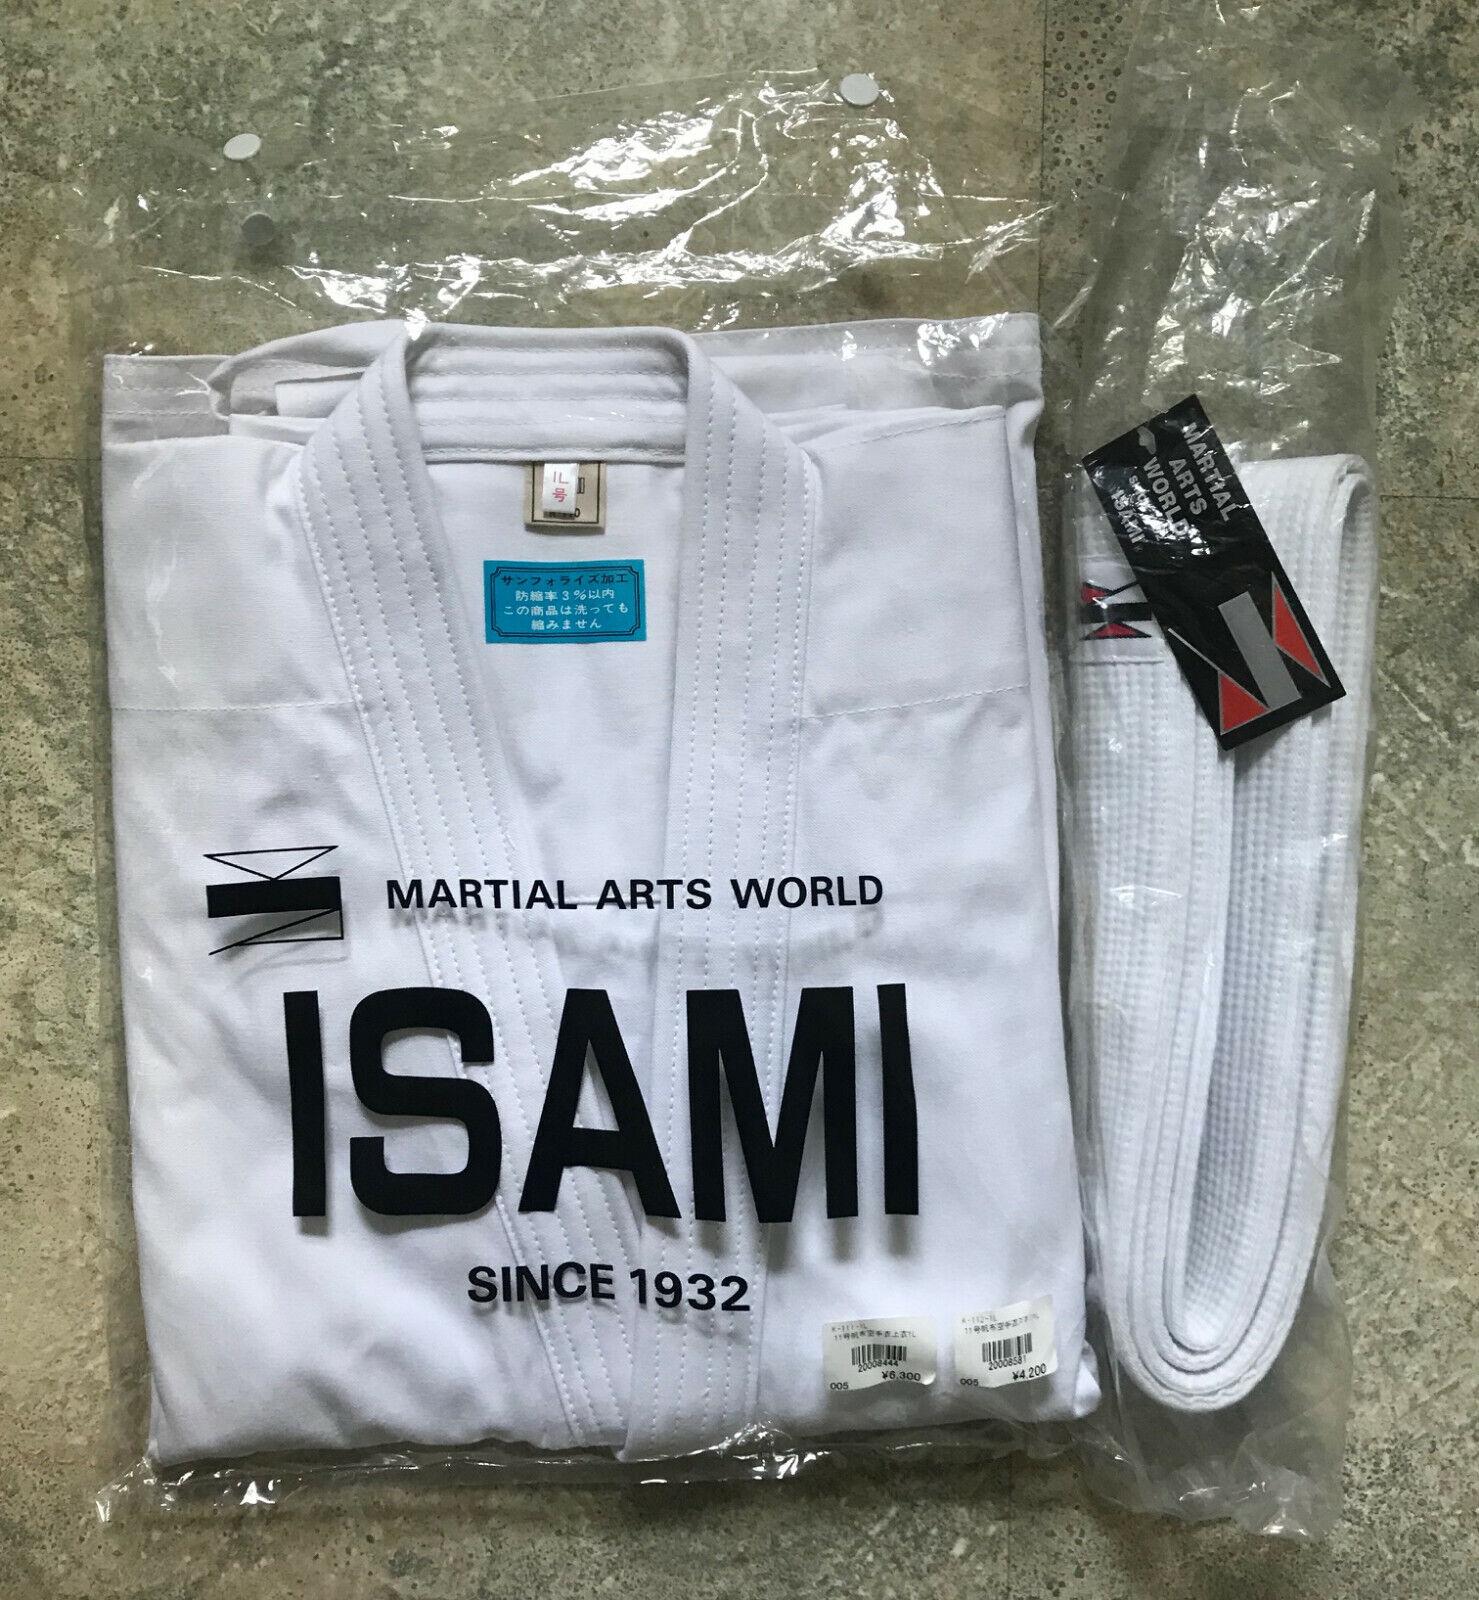 NWT NYA Isami Martial Arts World Karate Gi Uniform K -110 Storlek 1L